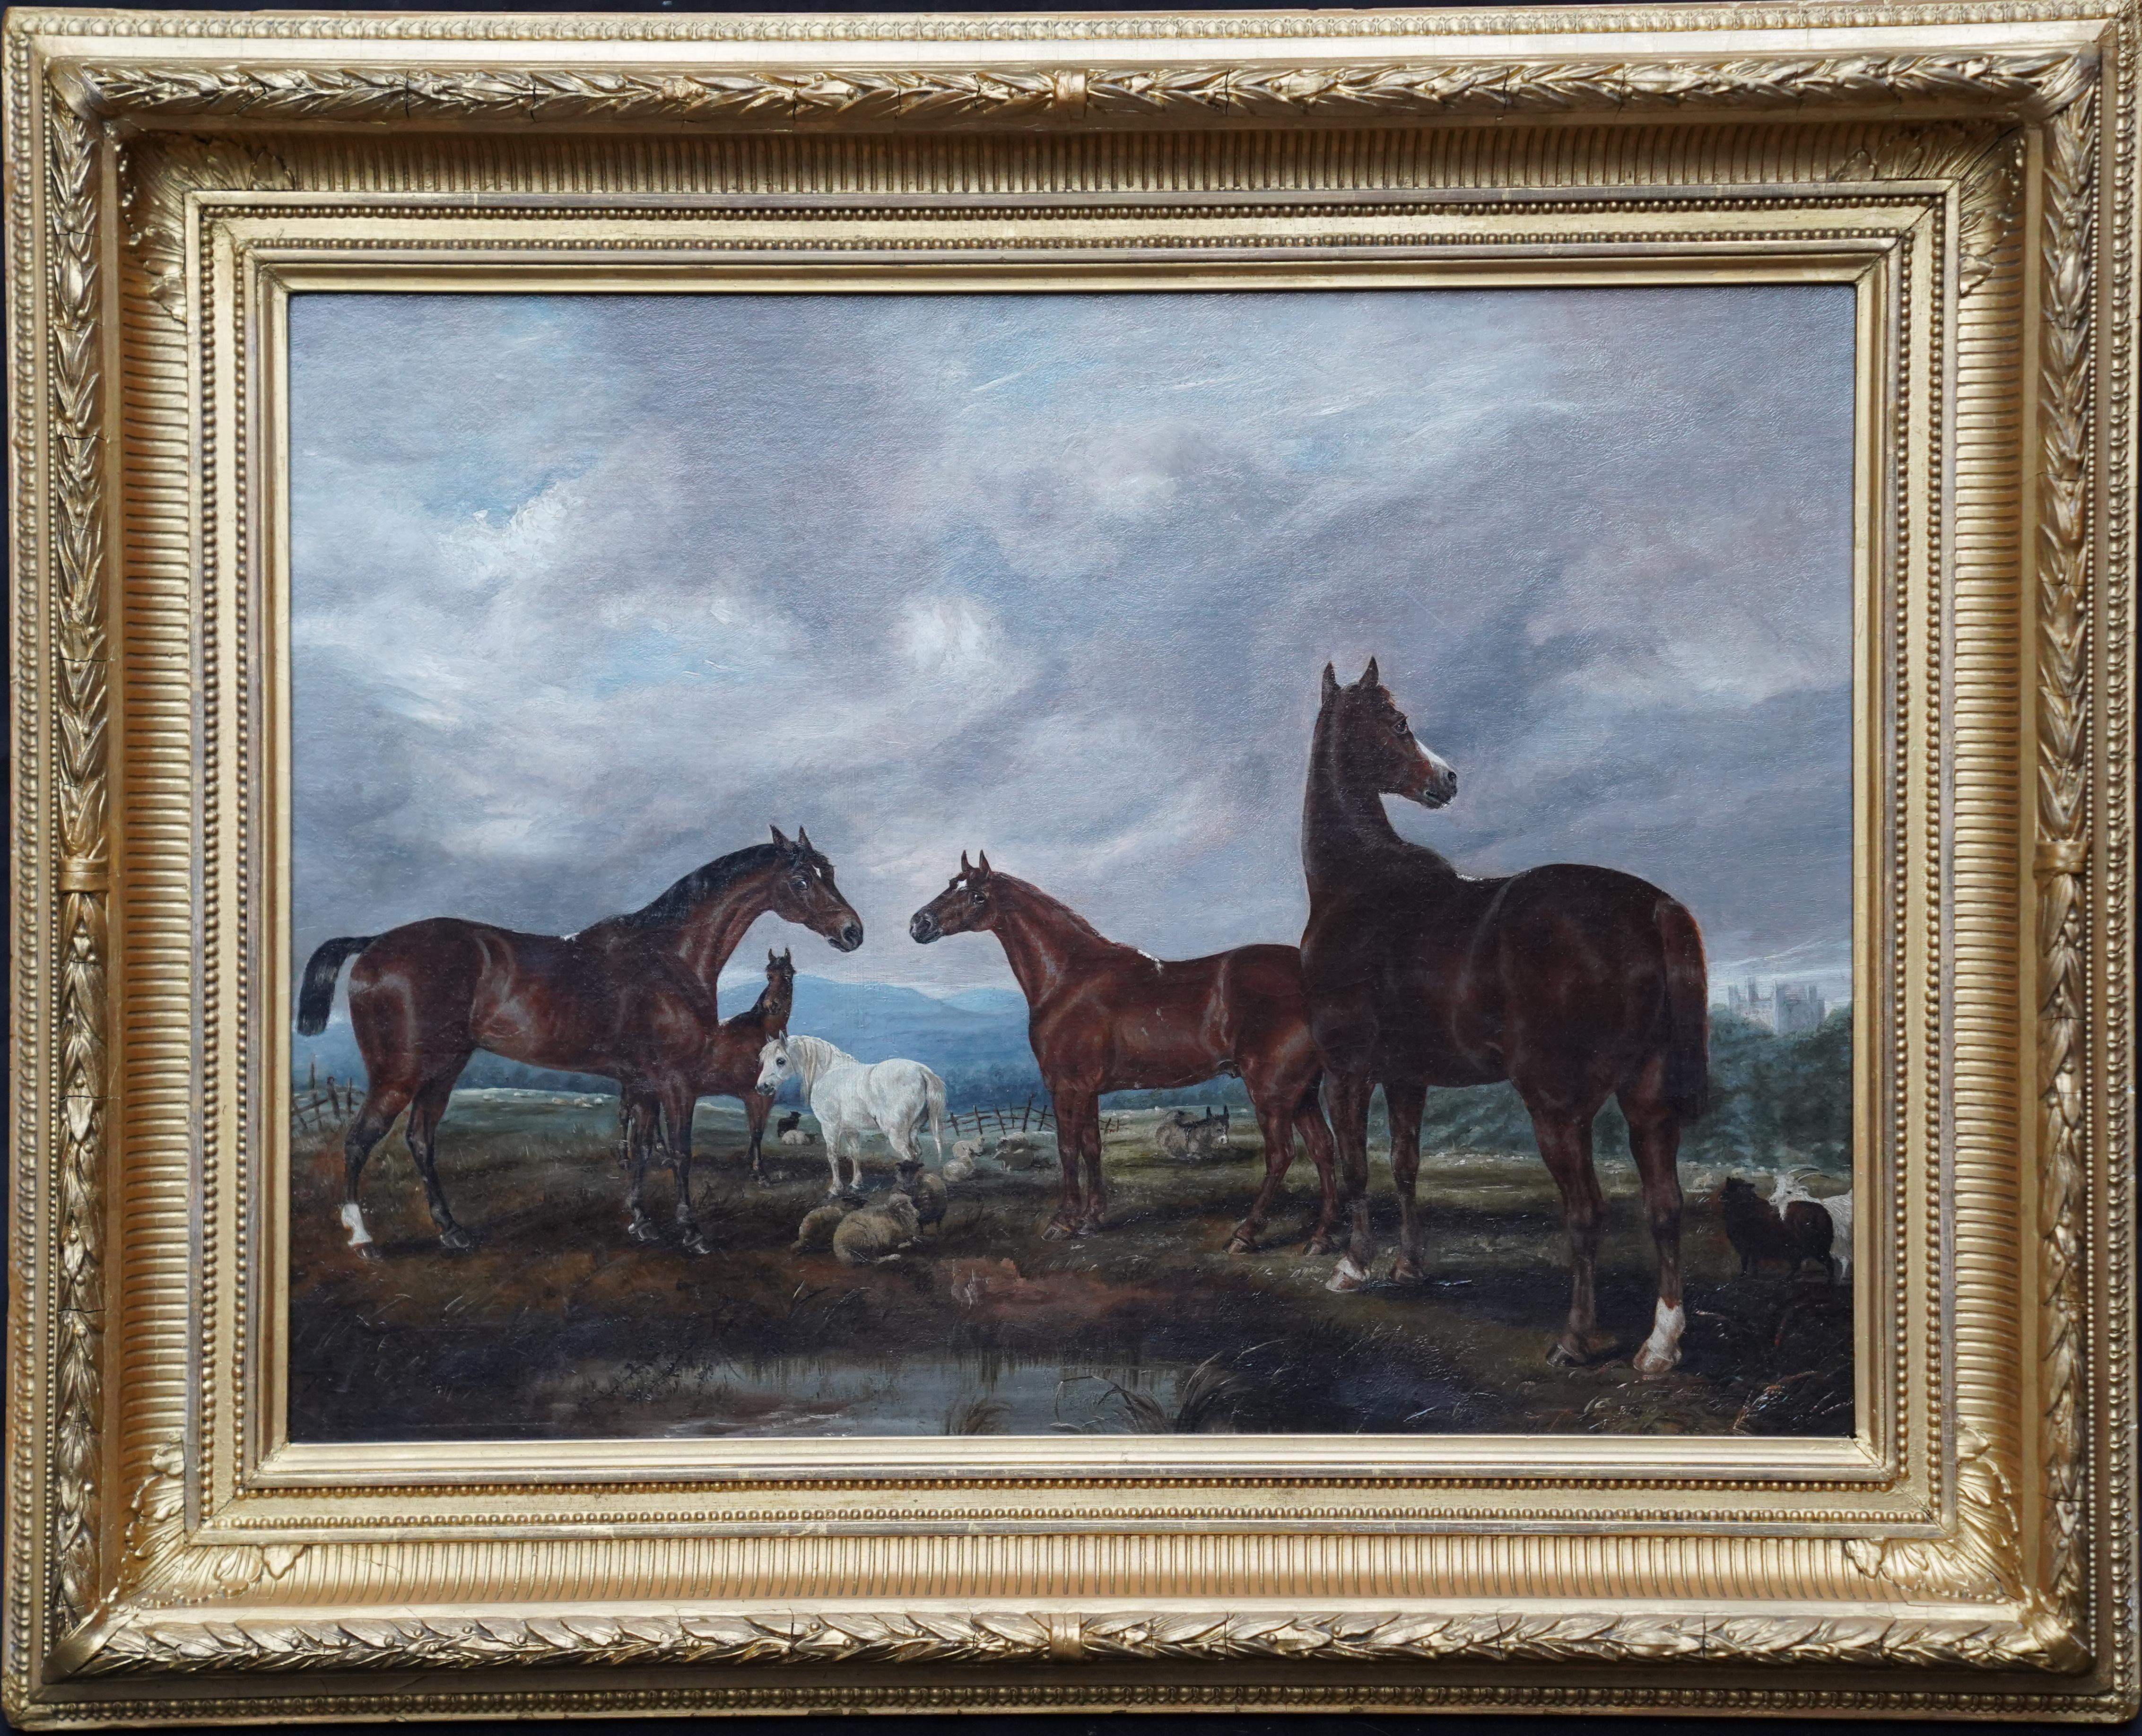 Horses in Landscape - British Victorian art equine animal portrait oil painting